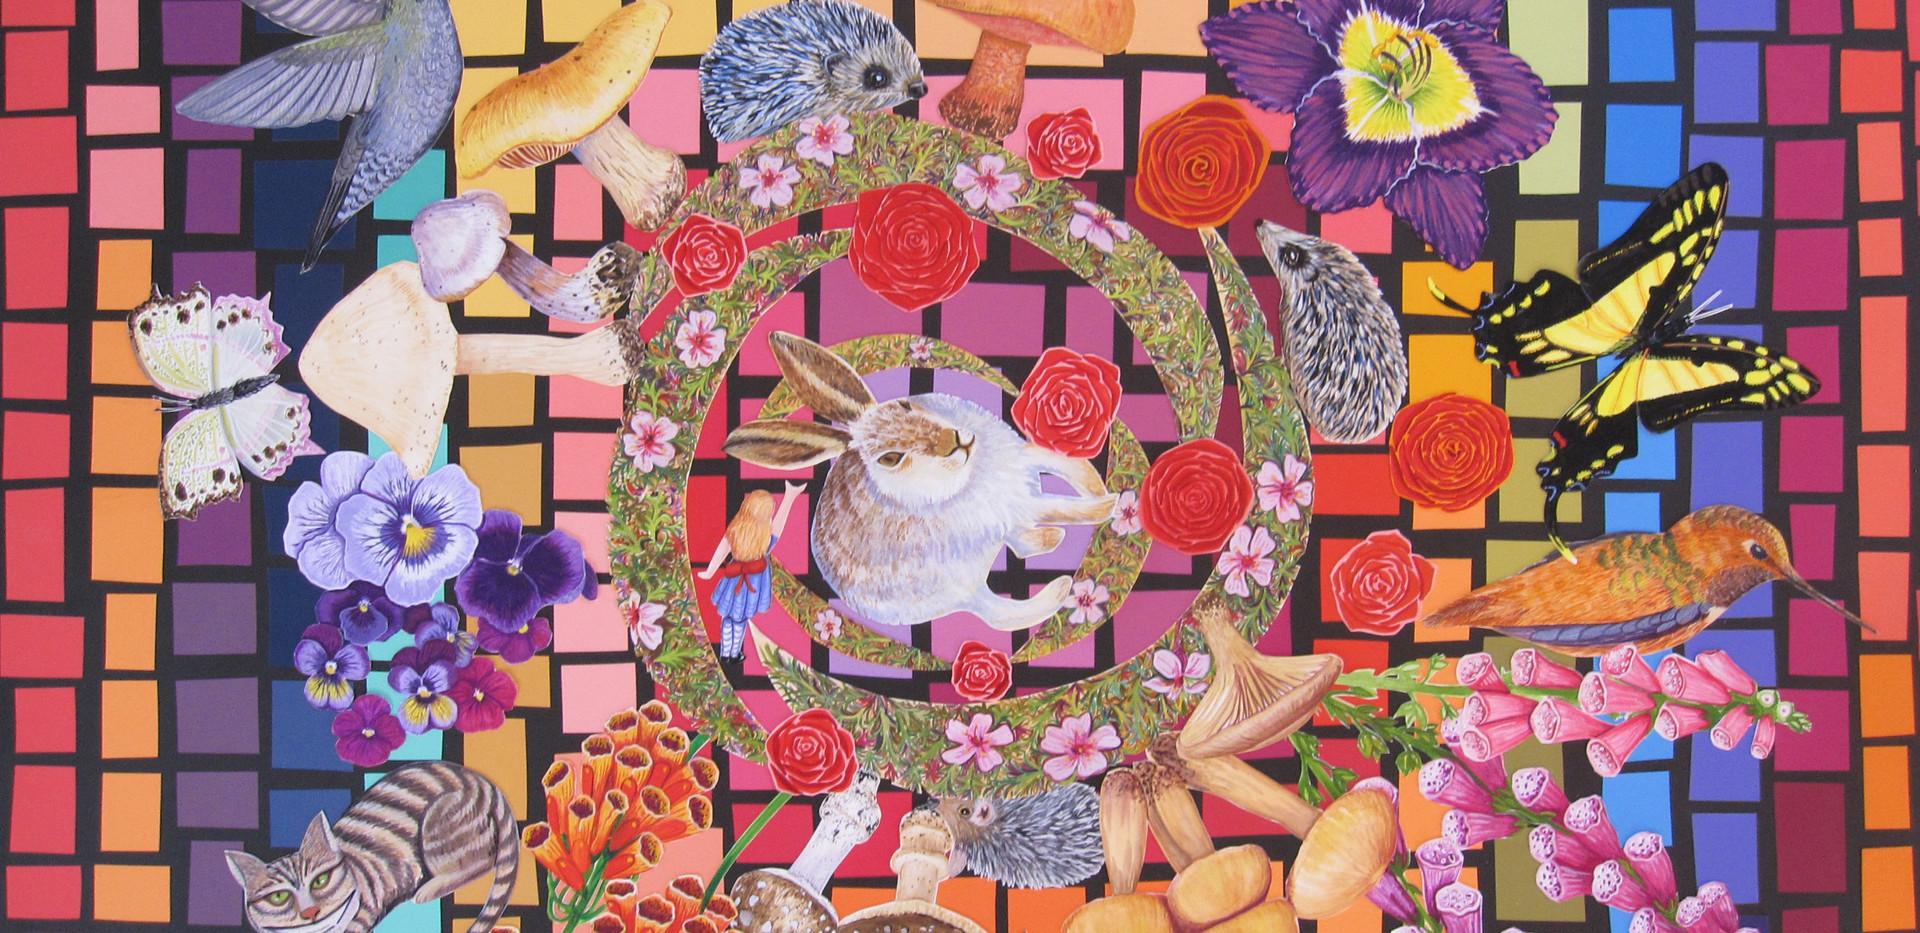 Lewis Carrolls Kaleidoscope